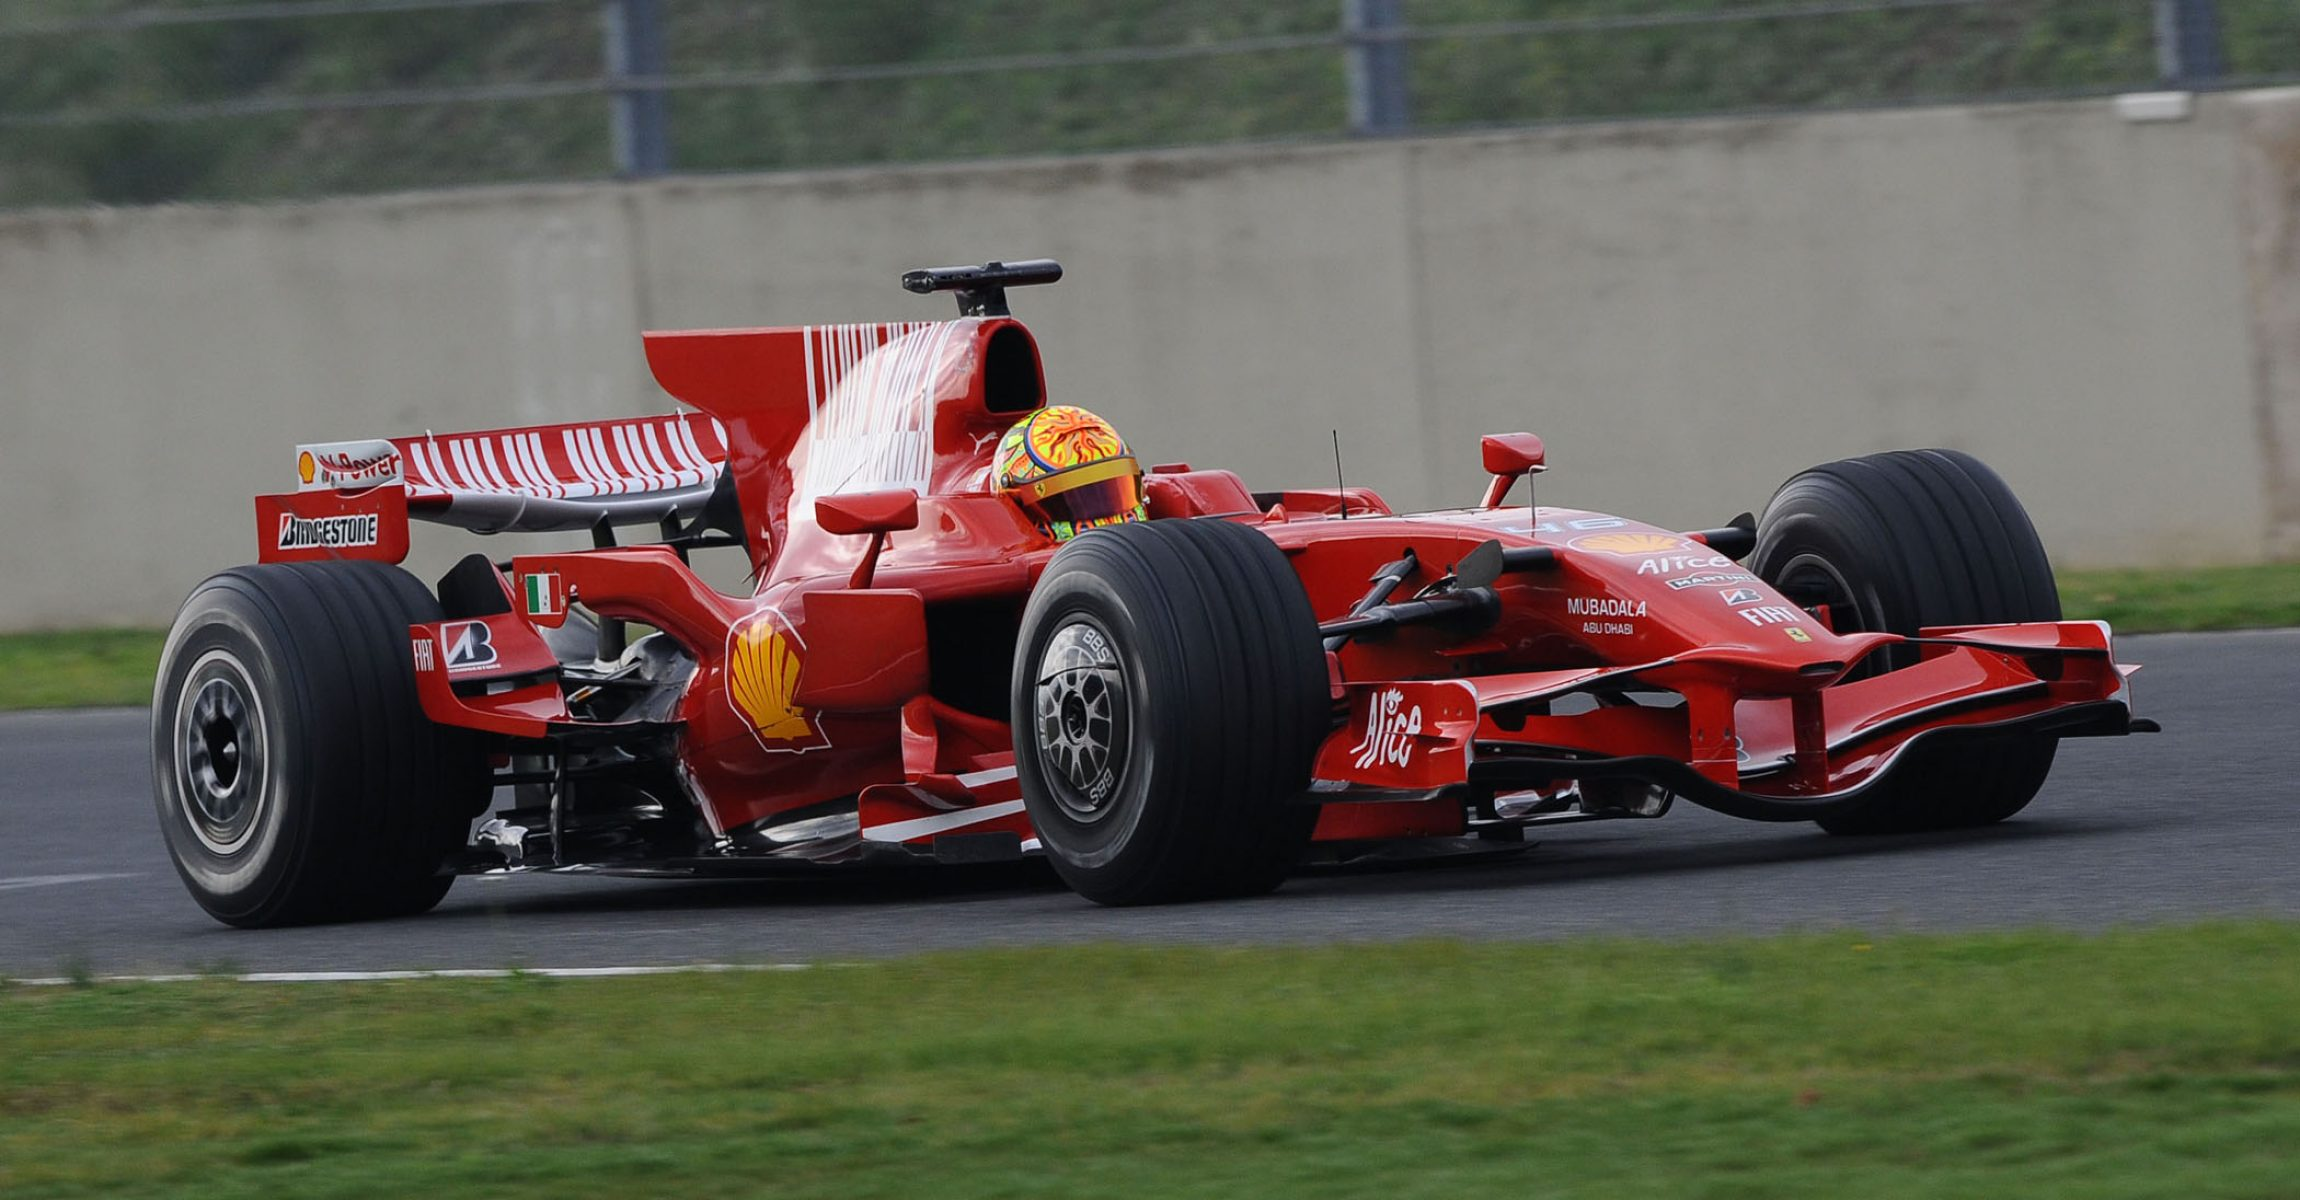 Valentino Rossi, Mugello, Ferrari test, 2008